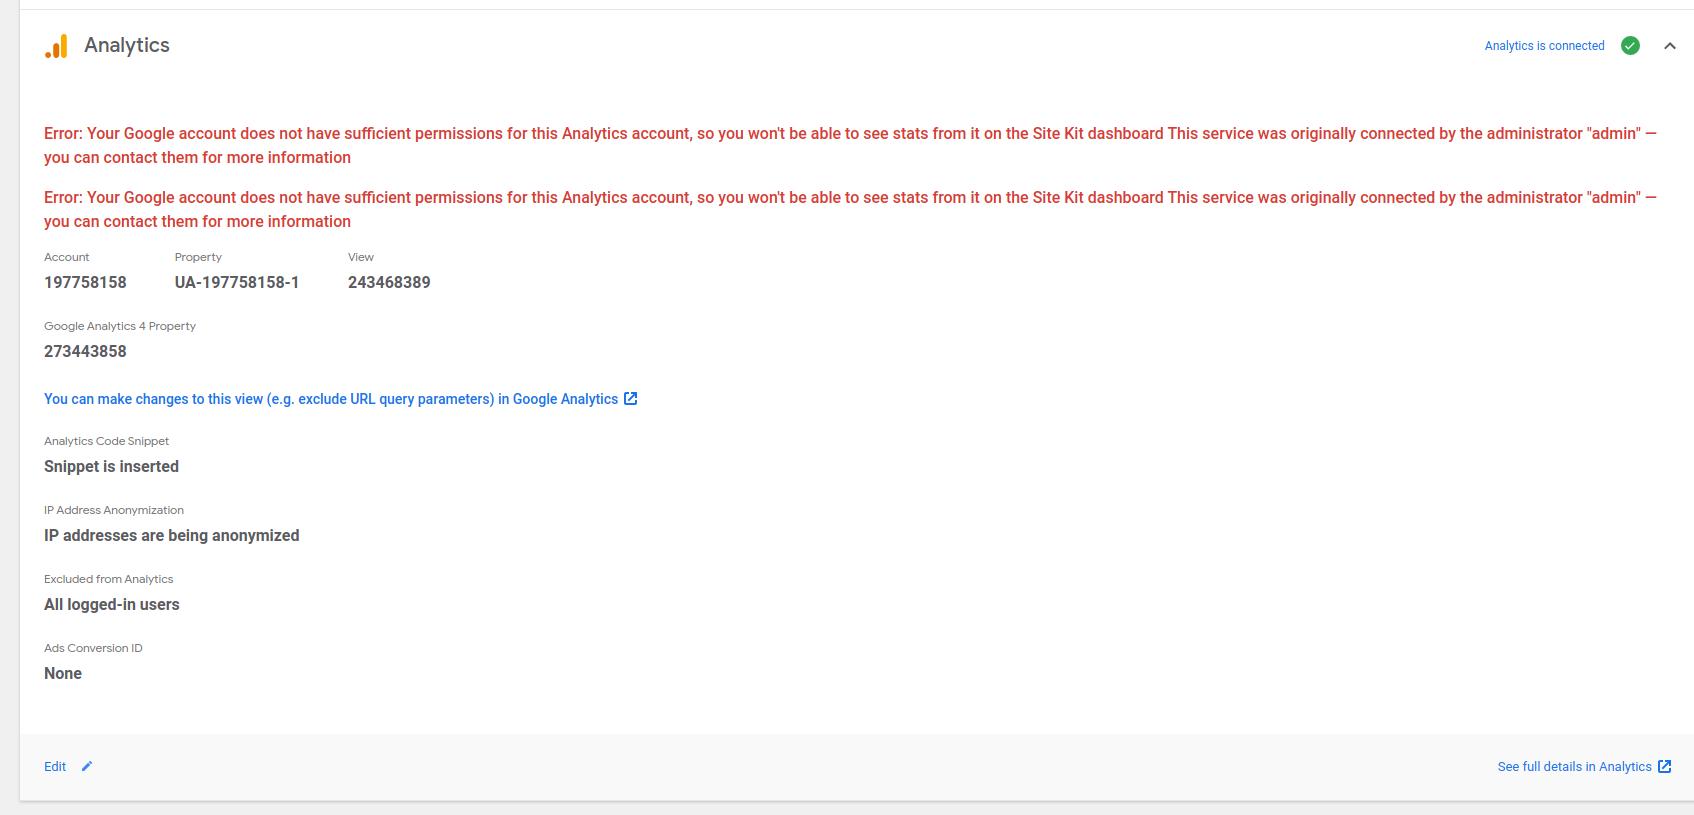 sitekit 10uplabs com_wp-admin_admin php_page=googlesitekit-settings